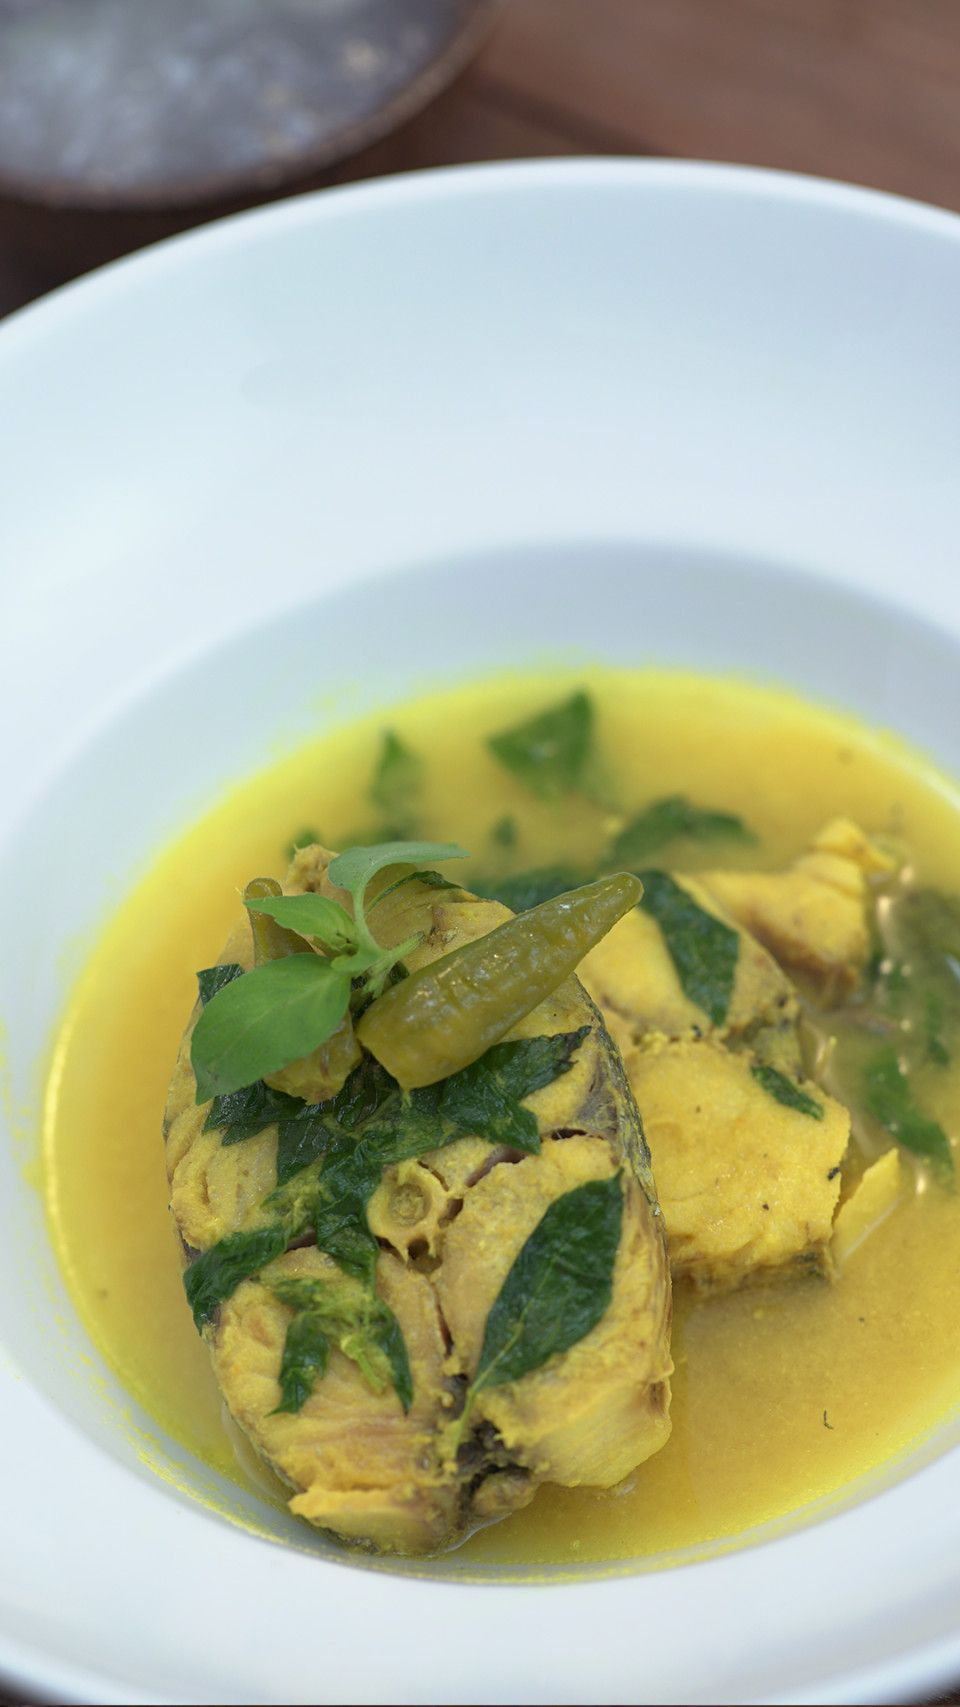 Ikan Kuah Kuning Khas Papua Resep Resep Masakan Makanan Dan Minuman Resep